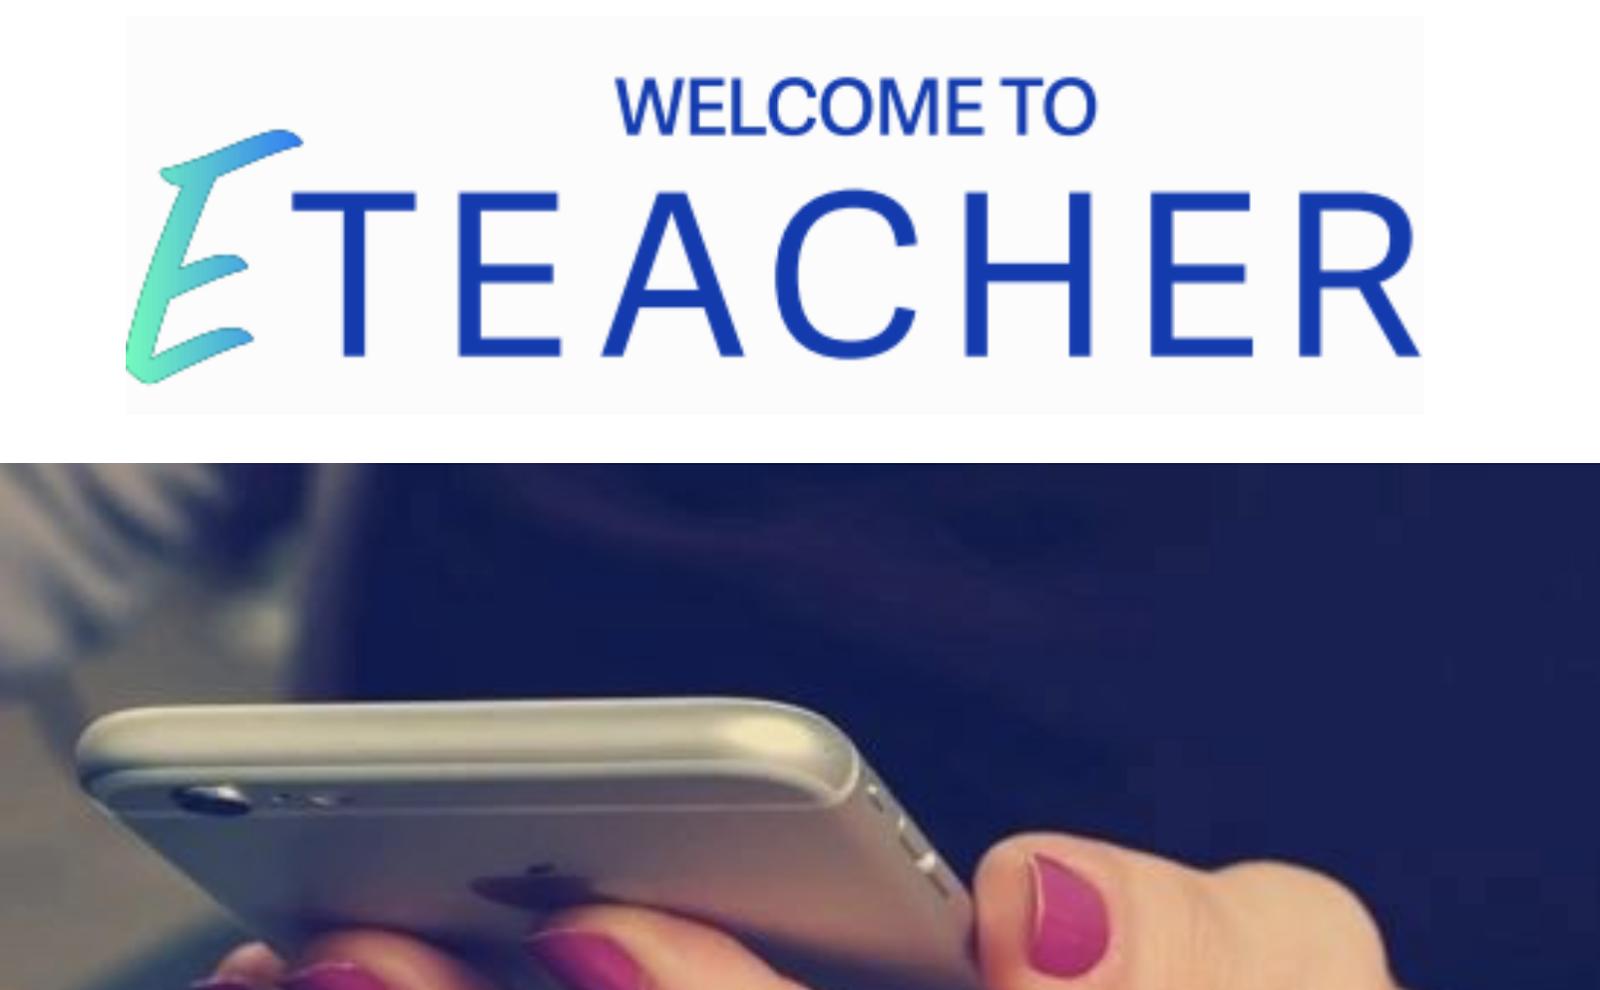 E Teacher | Subscription-based Platform